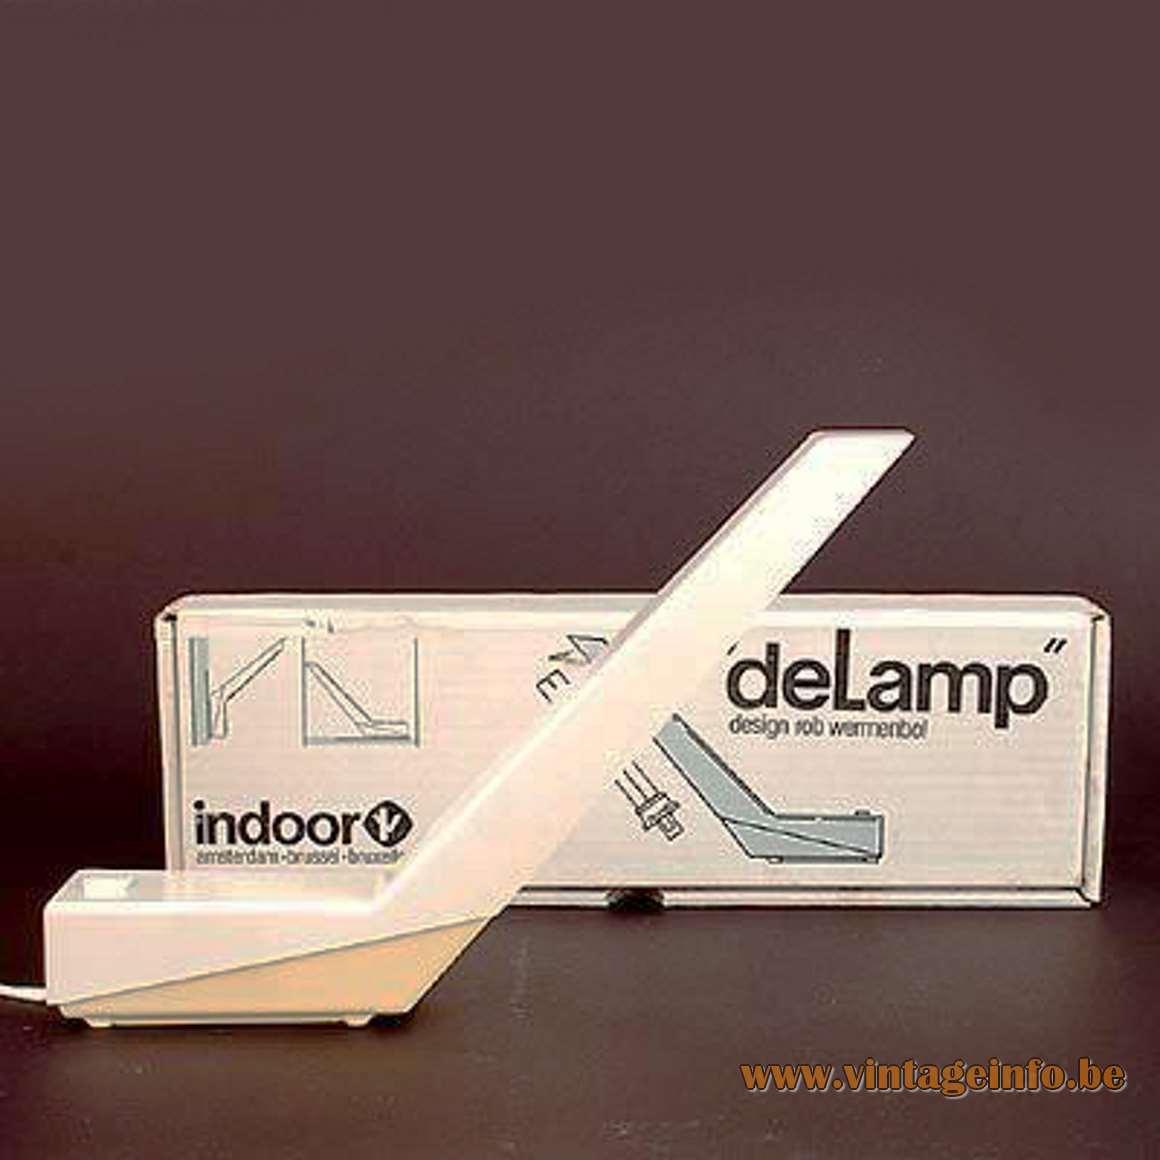 Indoor deLamp - Box - 1983 - Rob Wermenbol